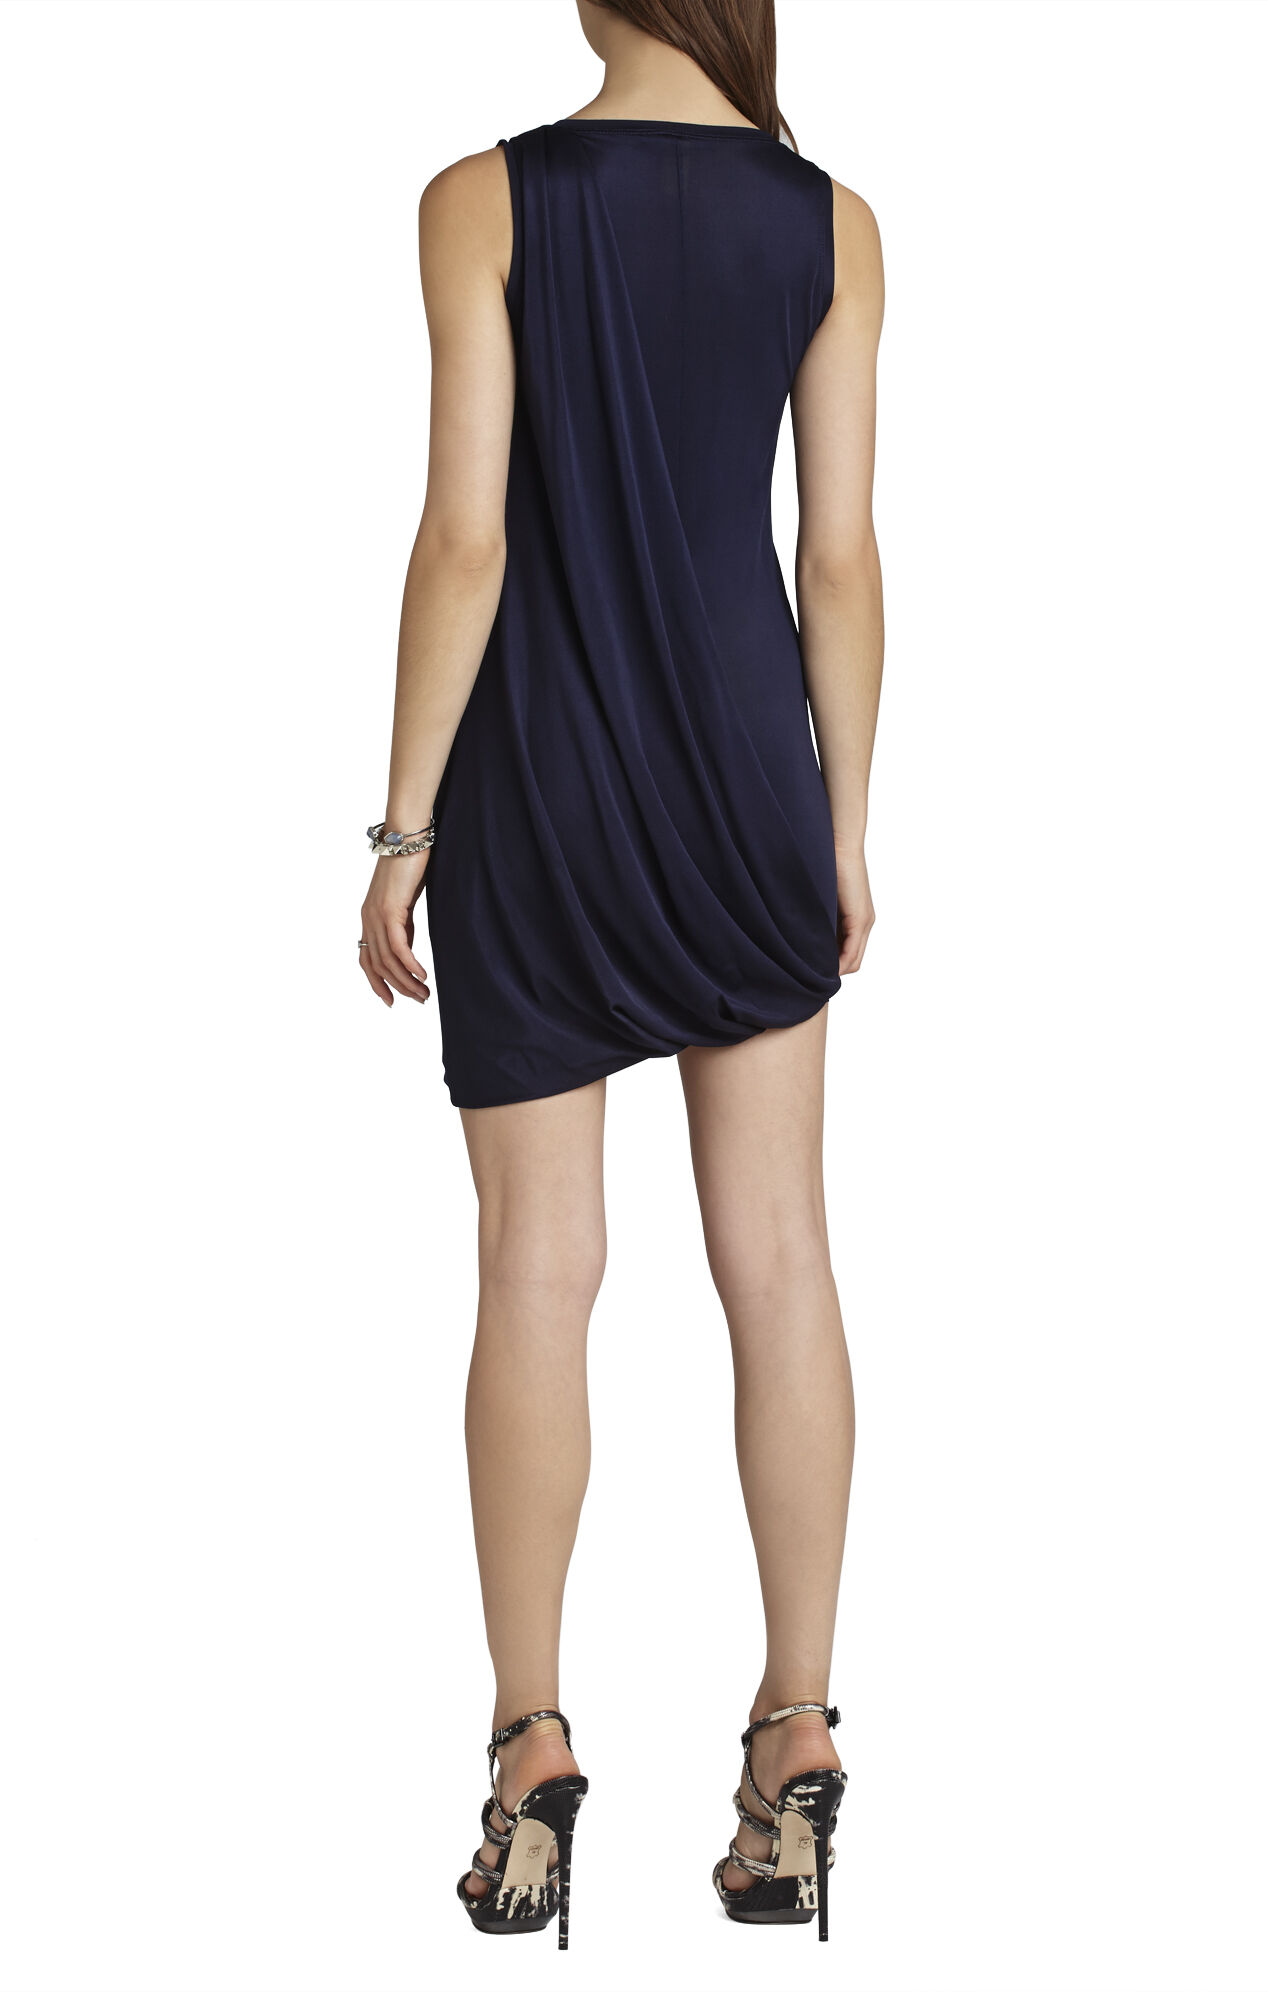 Evie Draped-Side Bubble-Skirt Dress